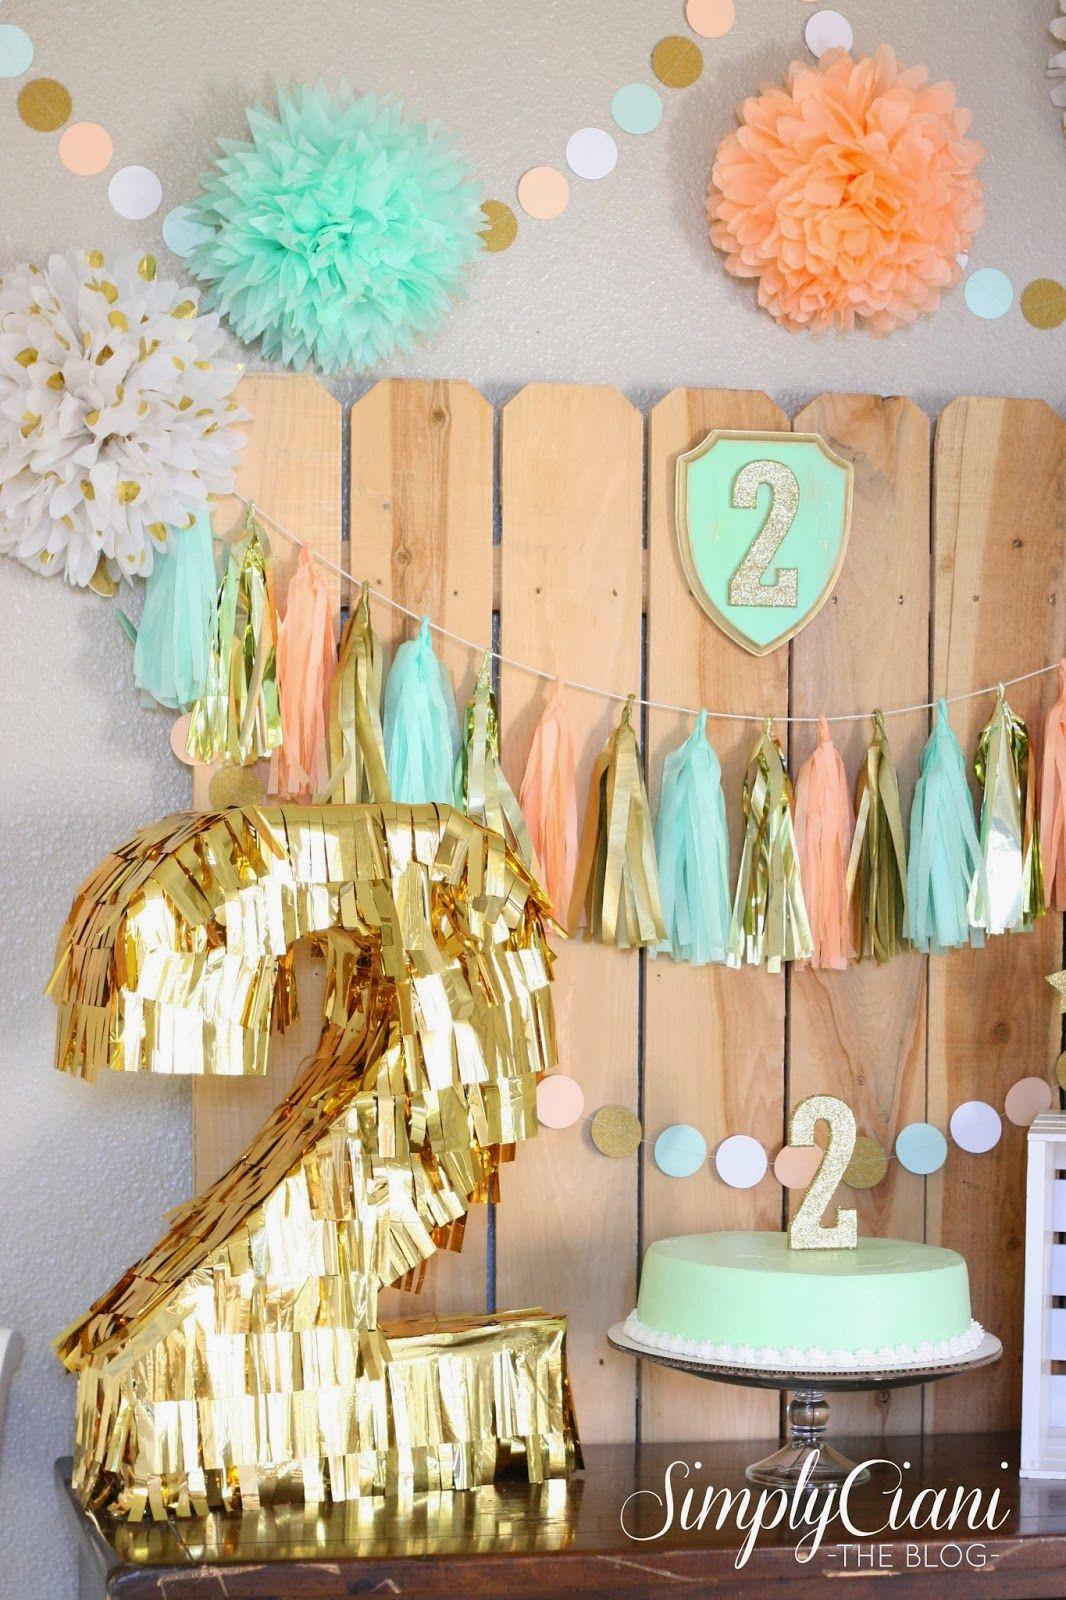 Me gusta mucho esta decoraci n para fiestas de cumplea os - Decoracion de cumpleanos infantiles ...